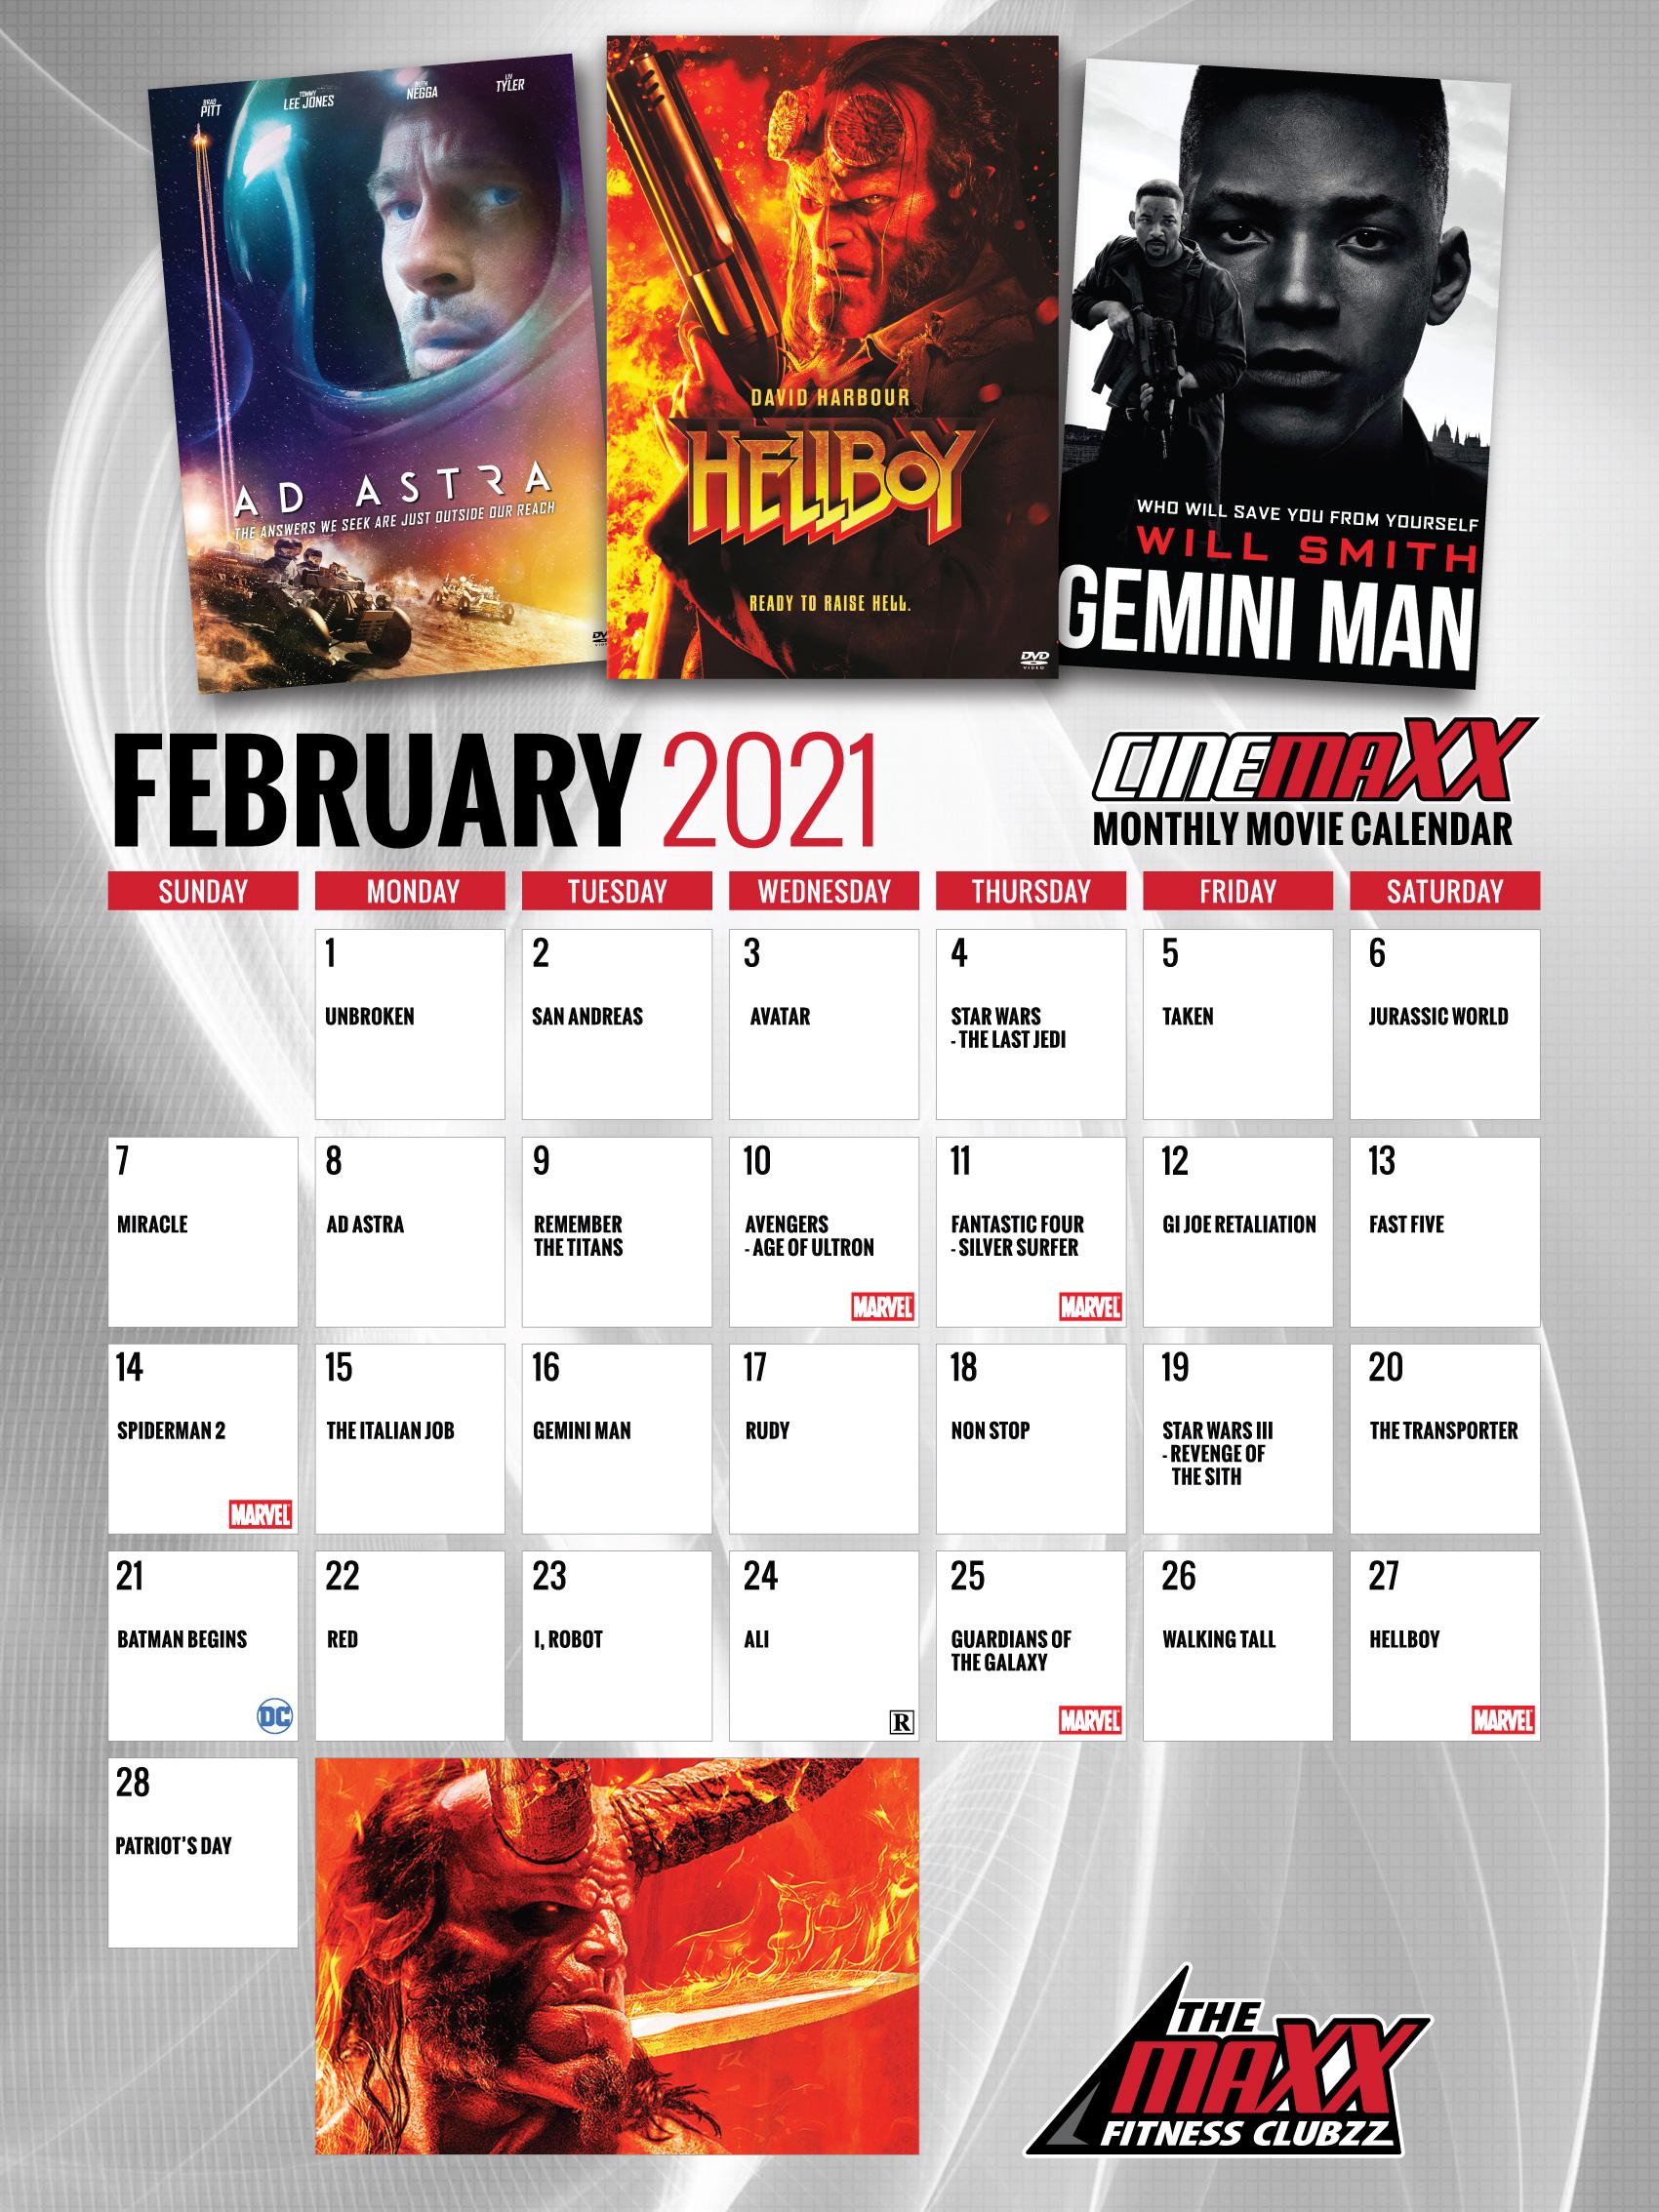 Maxx Fitness Saucon Valley : fitness, saucon, valley, Cinemaxx, Movie, Theater, Fitness, Clubzz